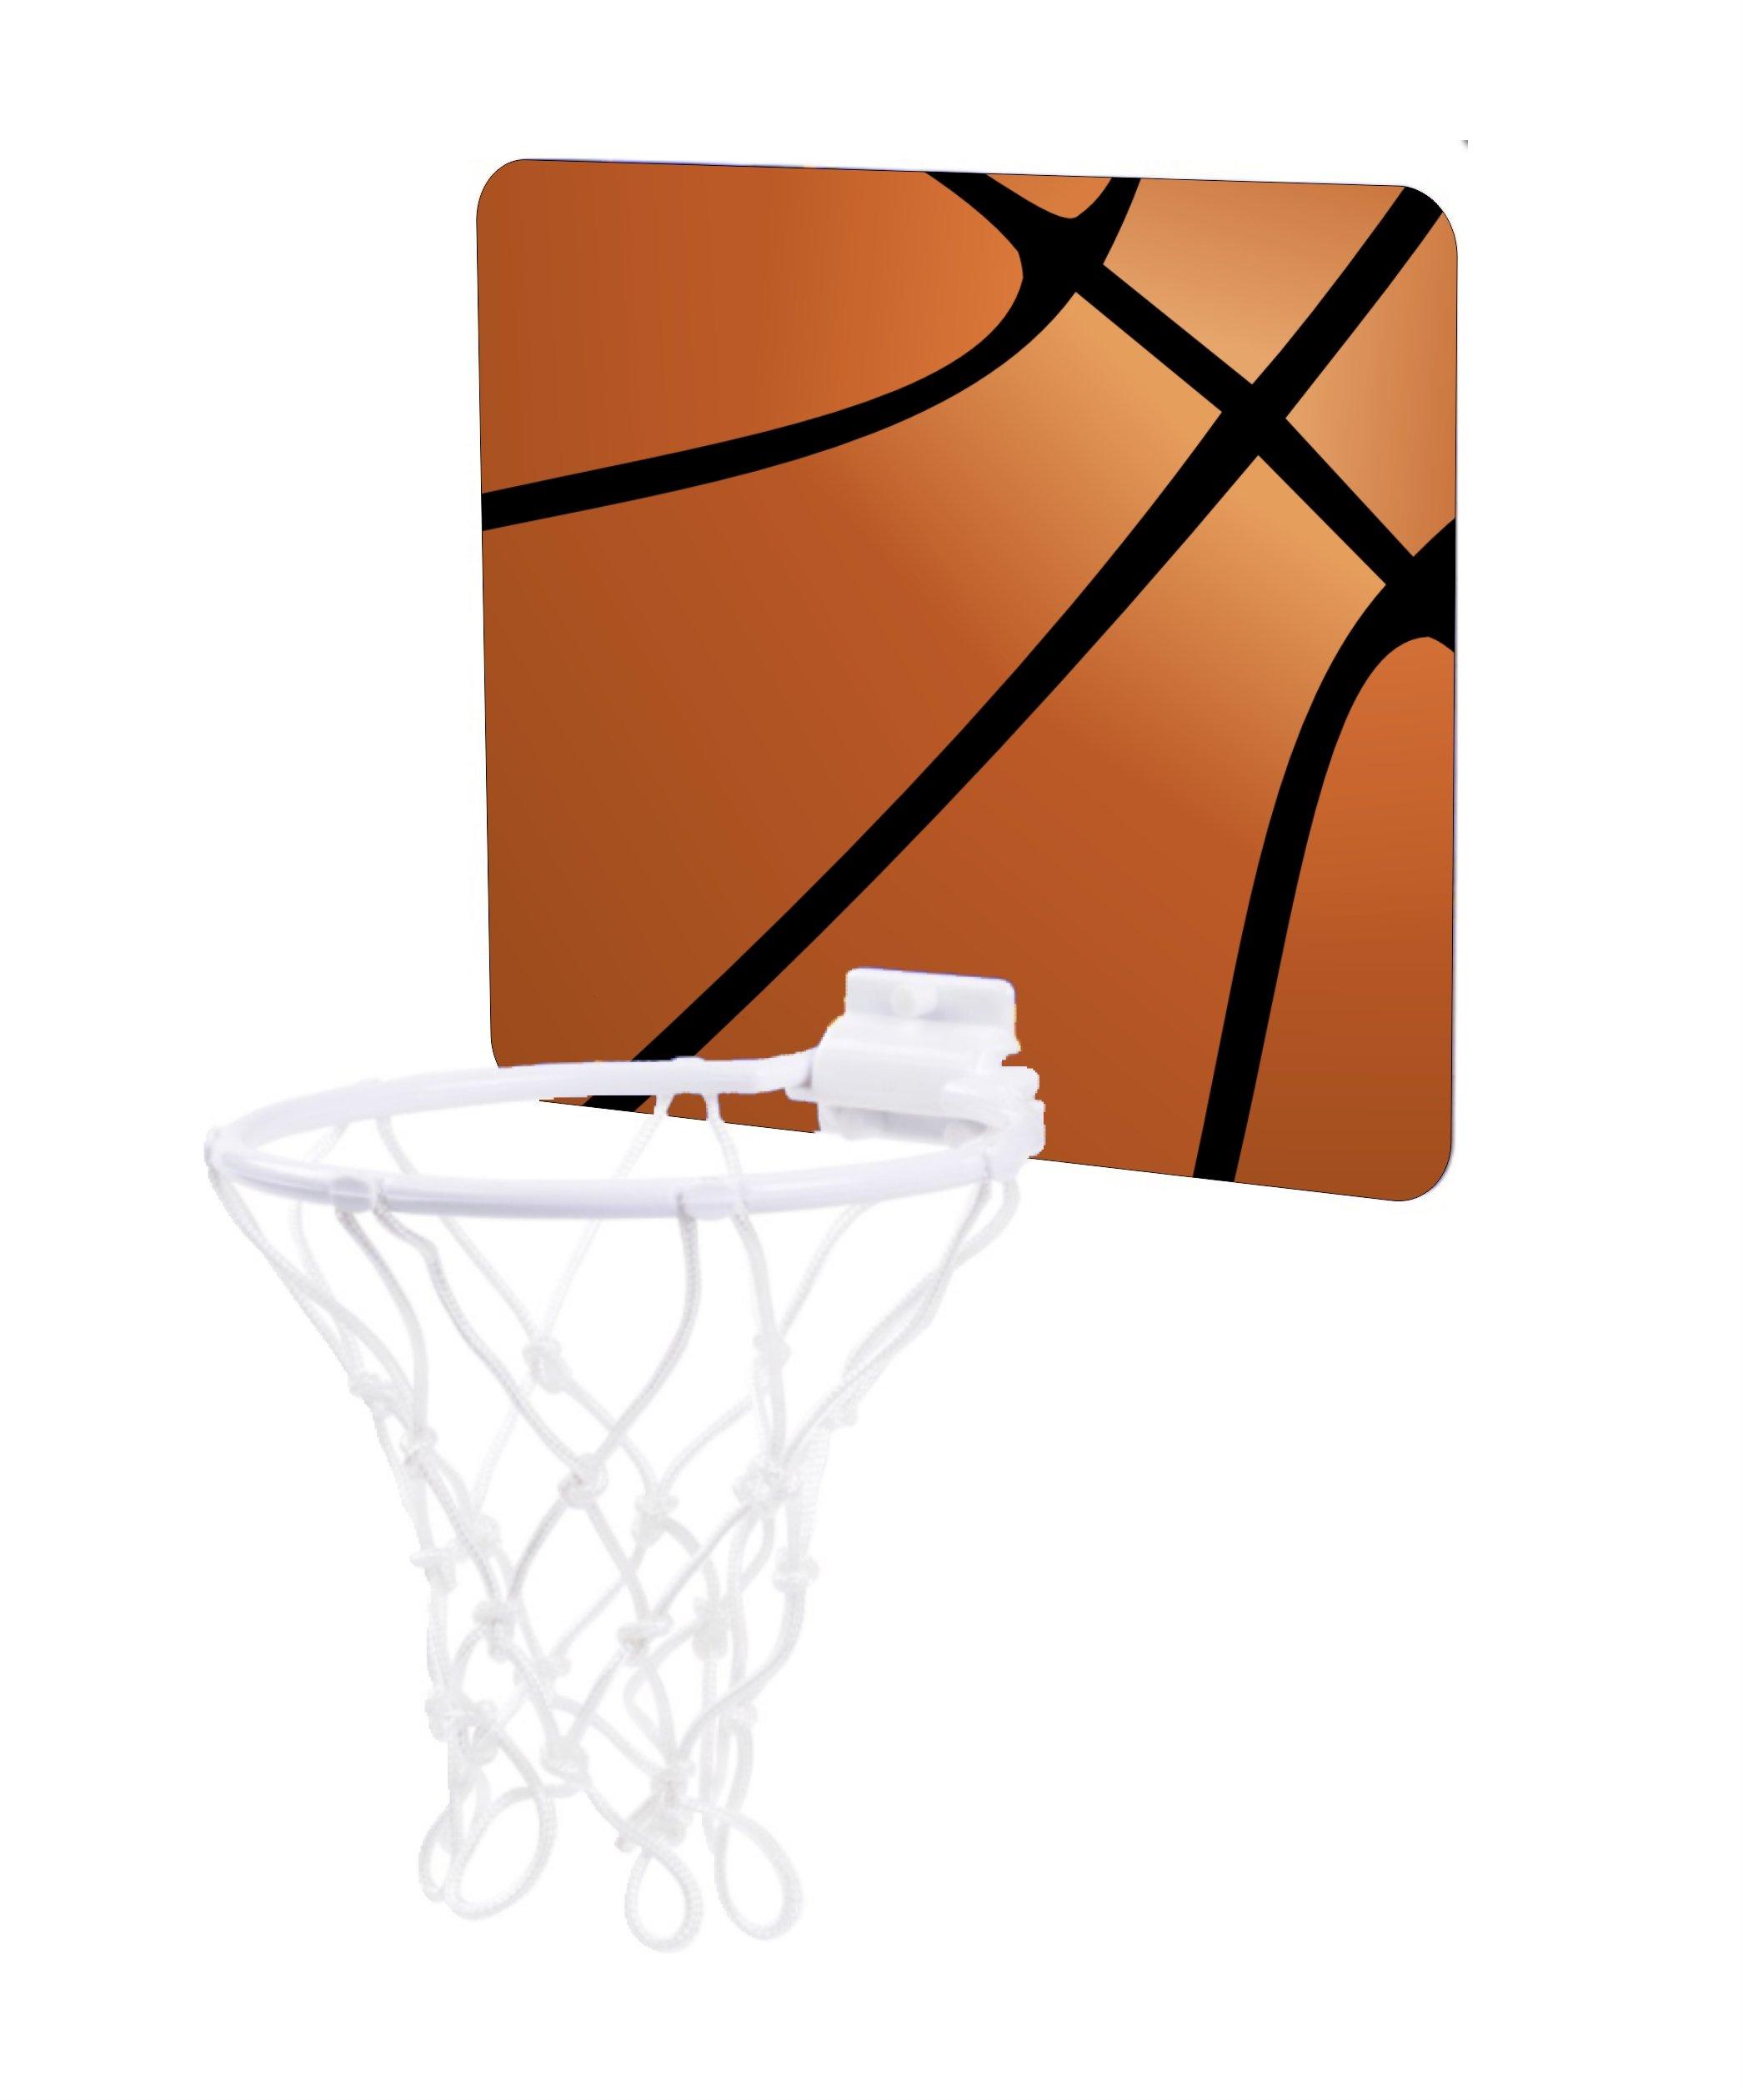 Jacks Outlet Basketball Up Close Design - Childrens 7.5'' x 9'' Mini Basketball Backboard - Goal with 6'' Hoop